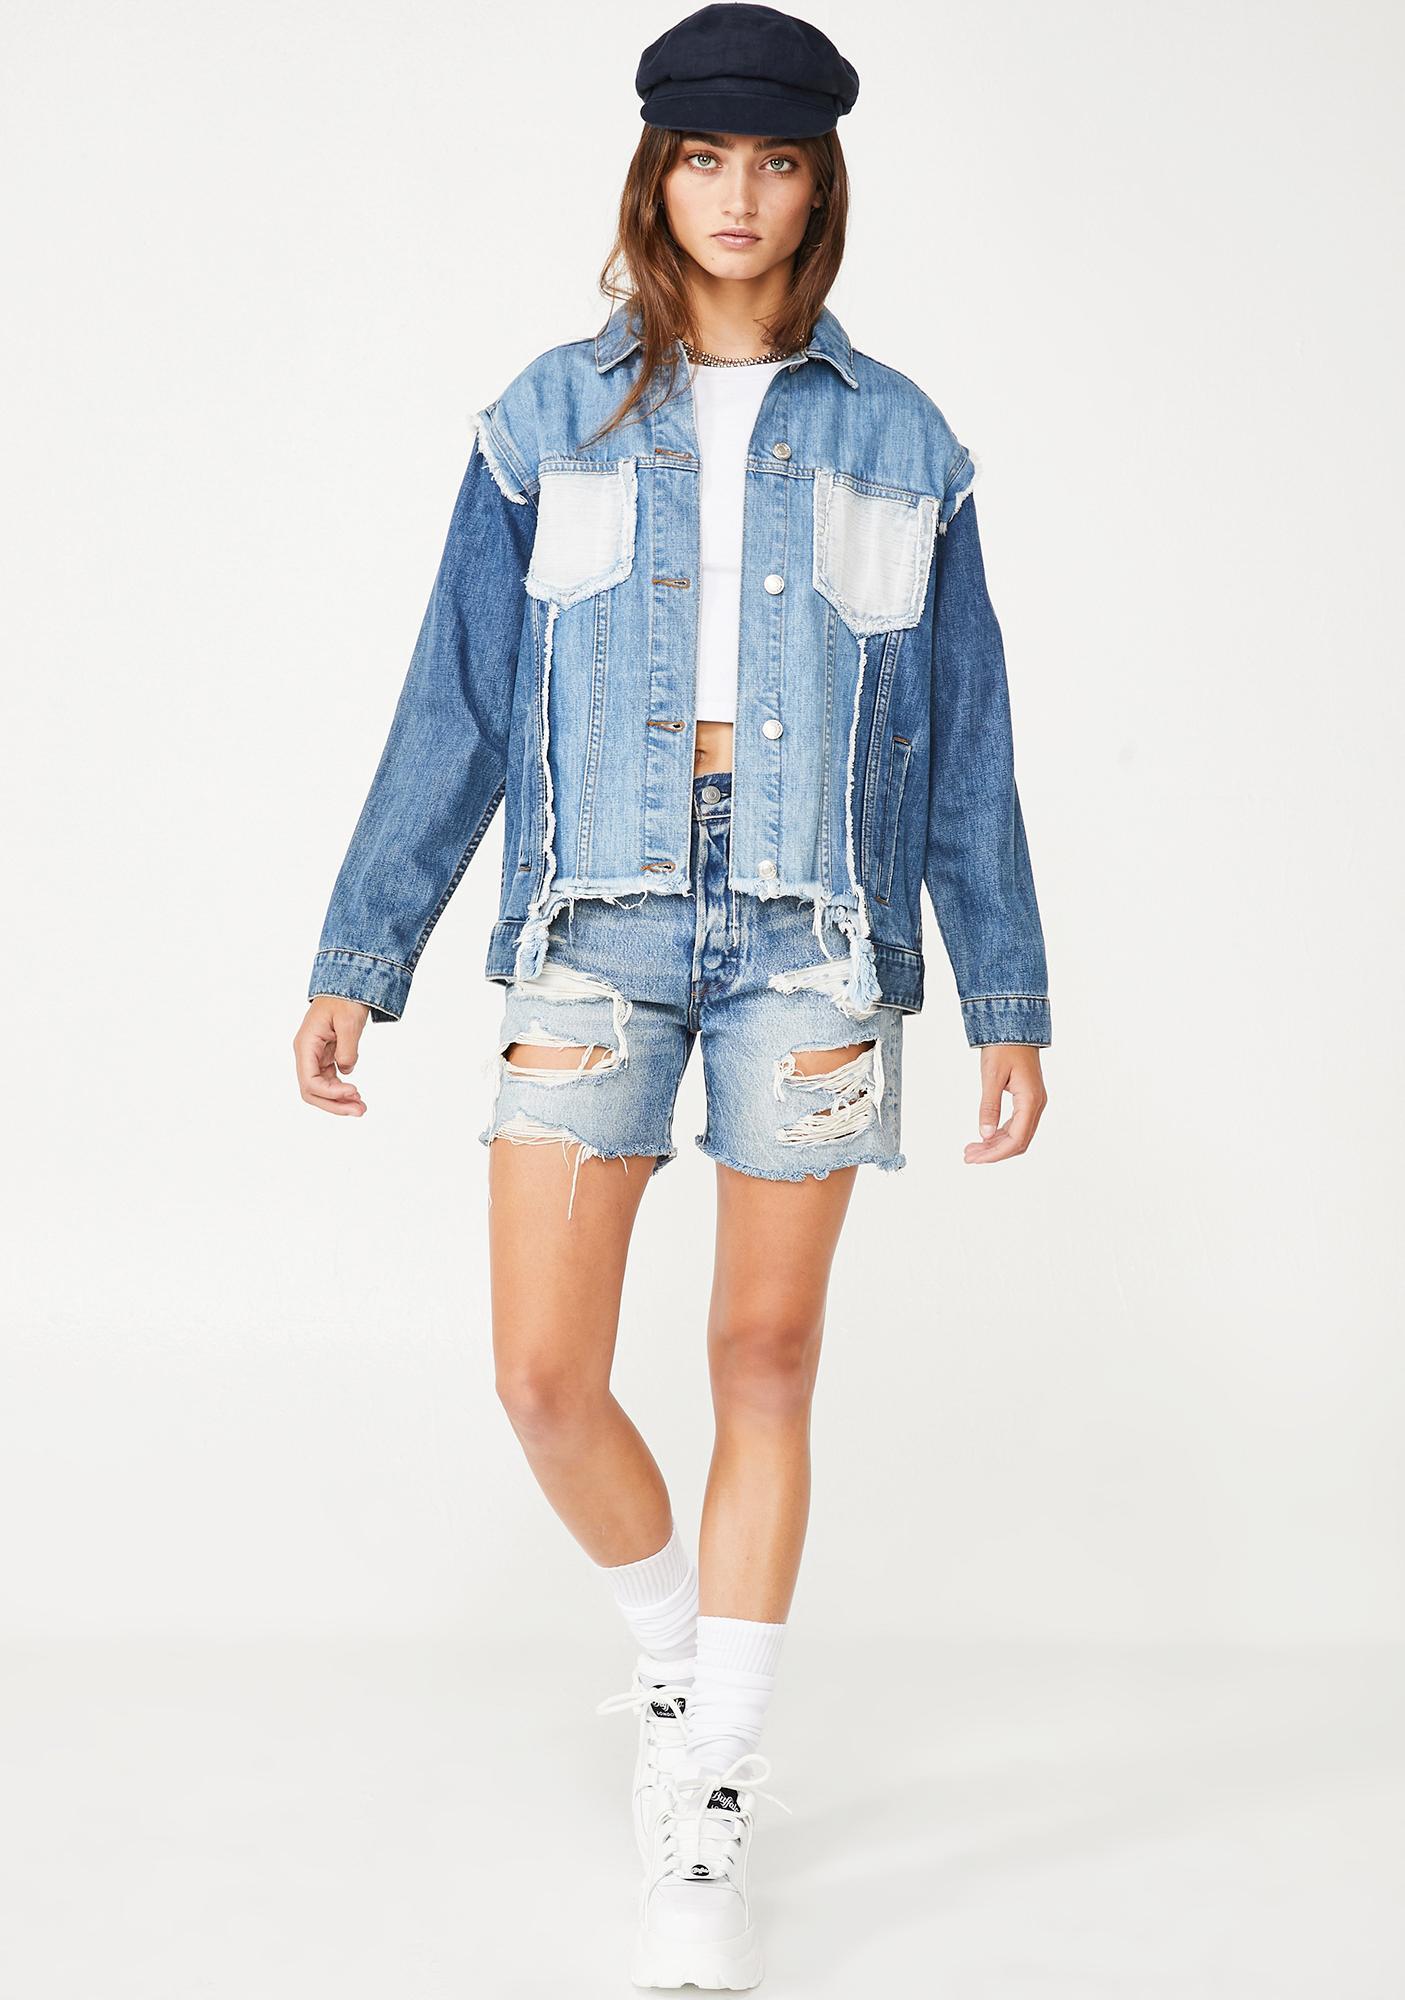 New City Sass Denim Jacket